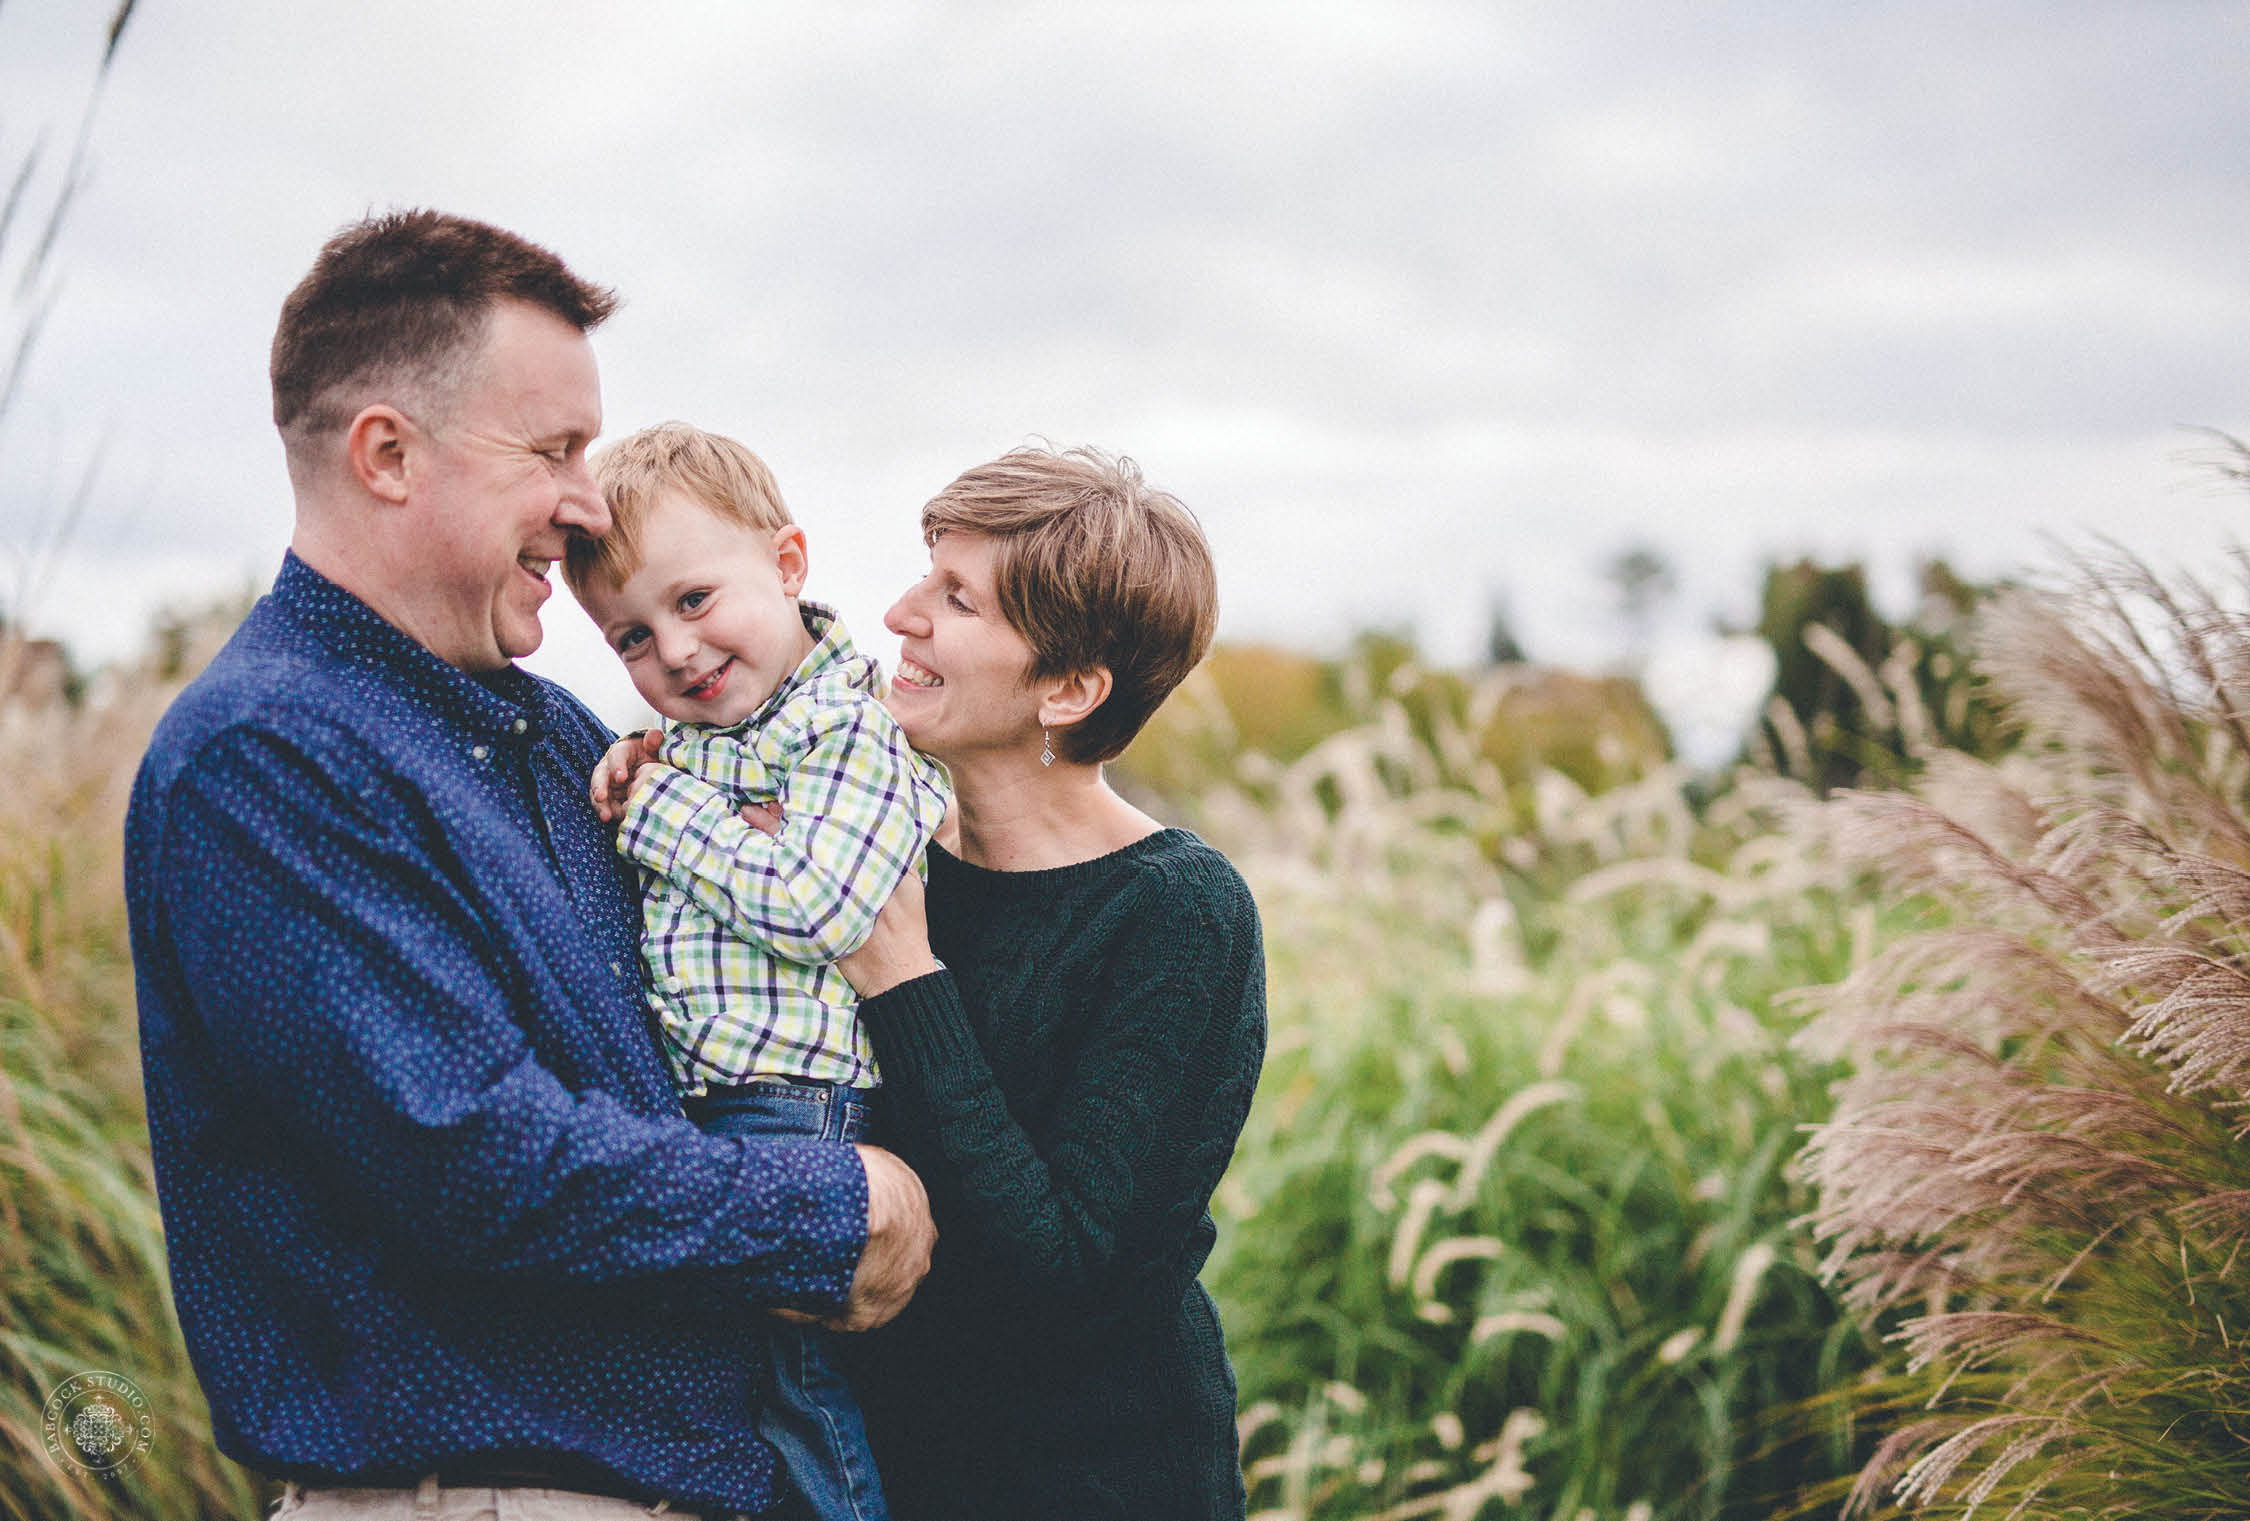 meyer-famly-children-photographer-dayton-ohio-3.jpg